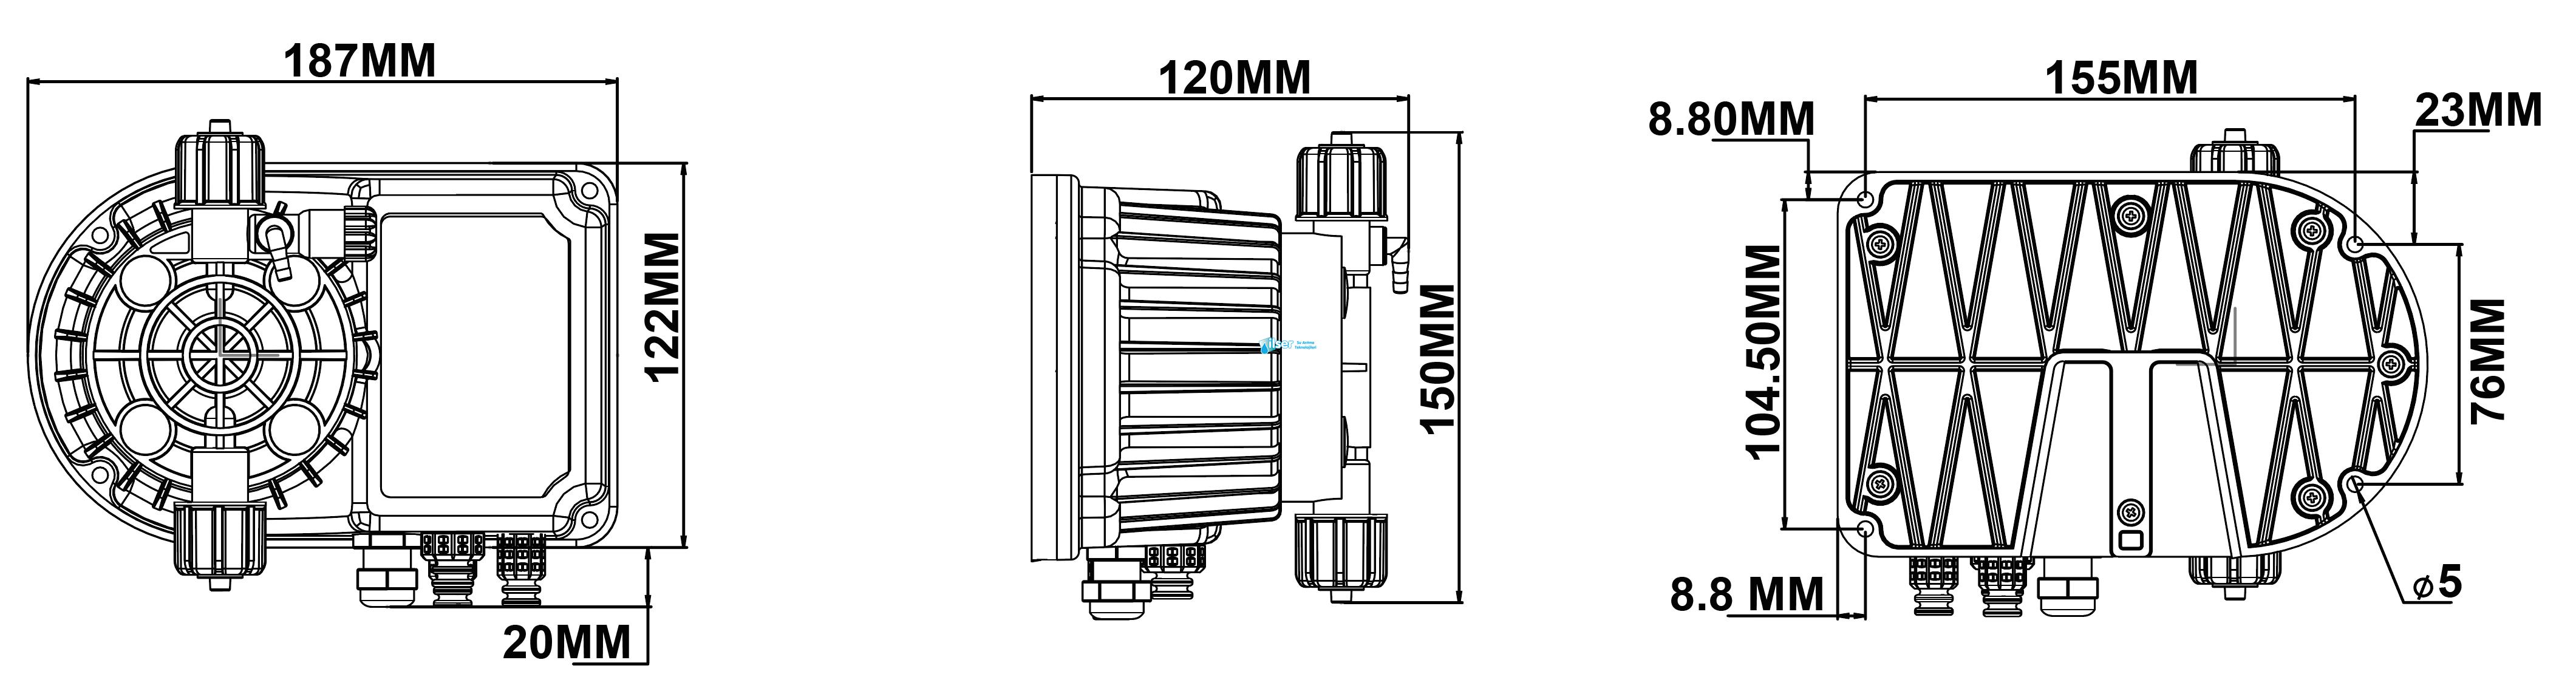 Antech DP LARA A 10L/5B V220FAT Dozaj Pompası